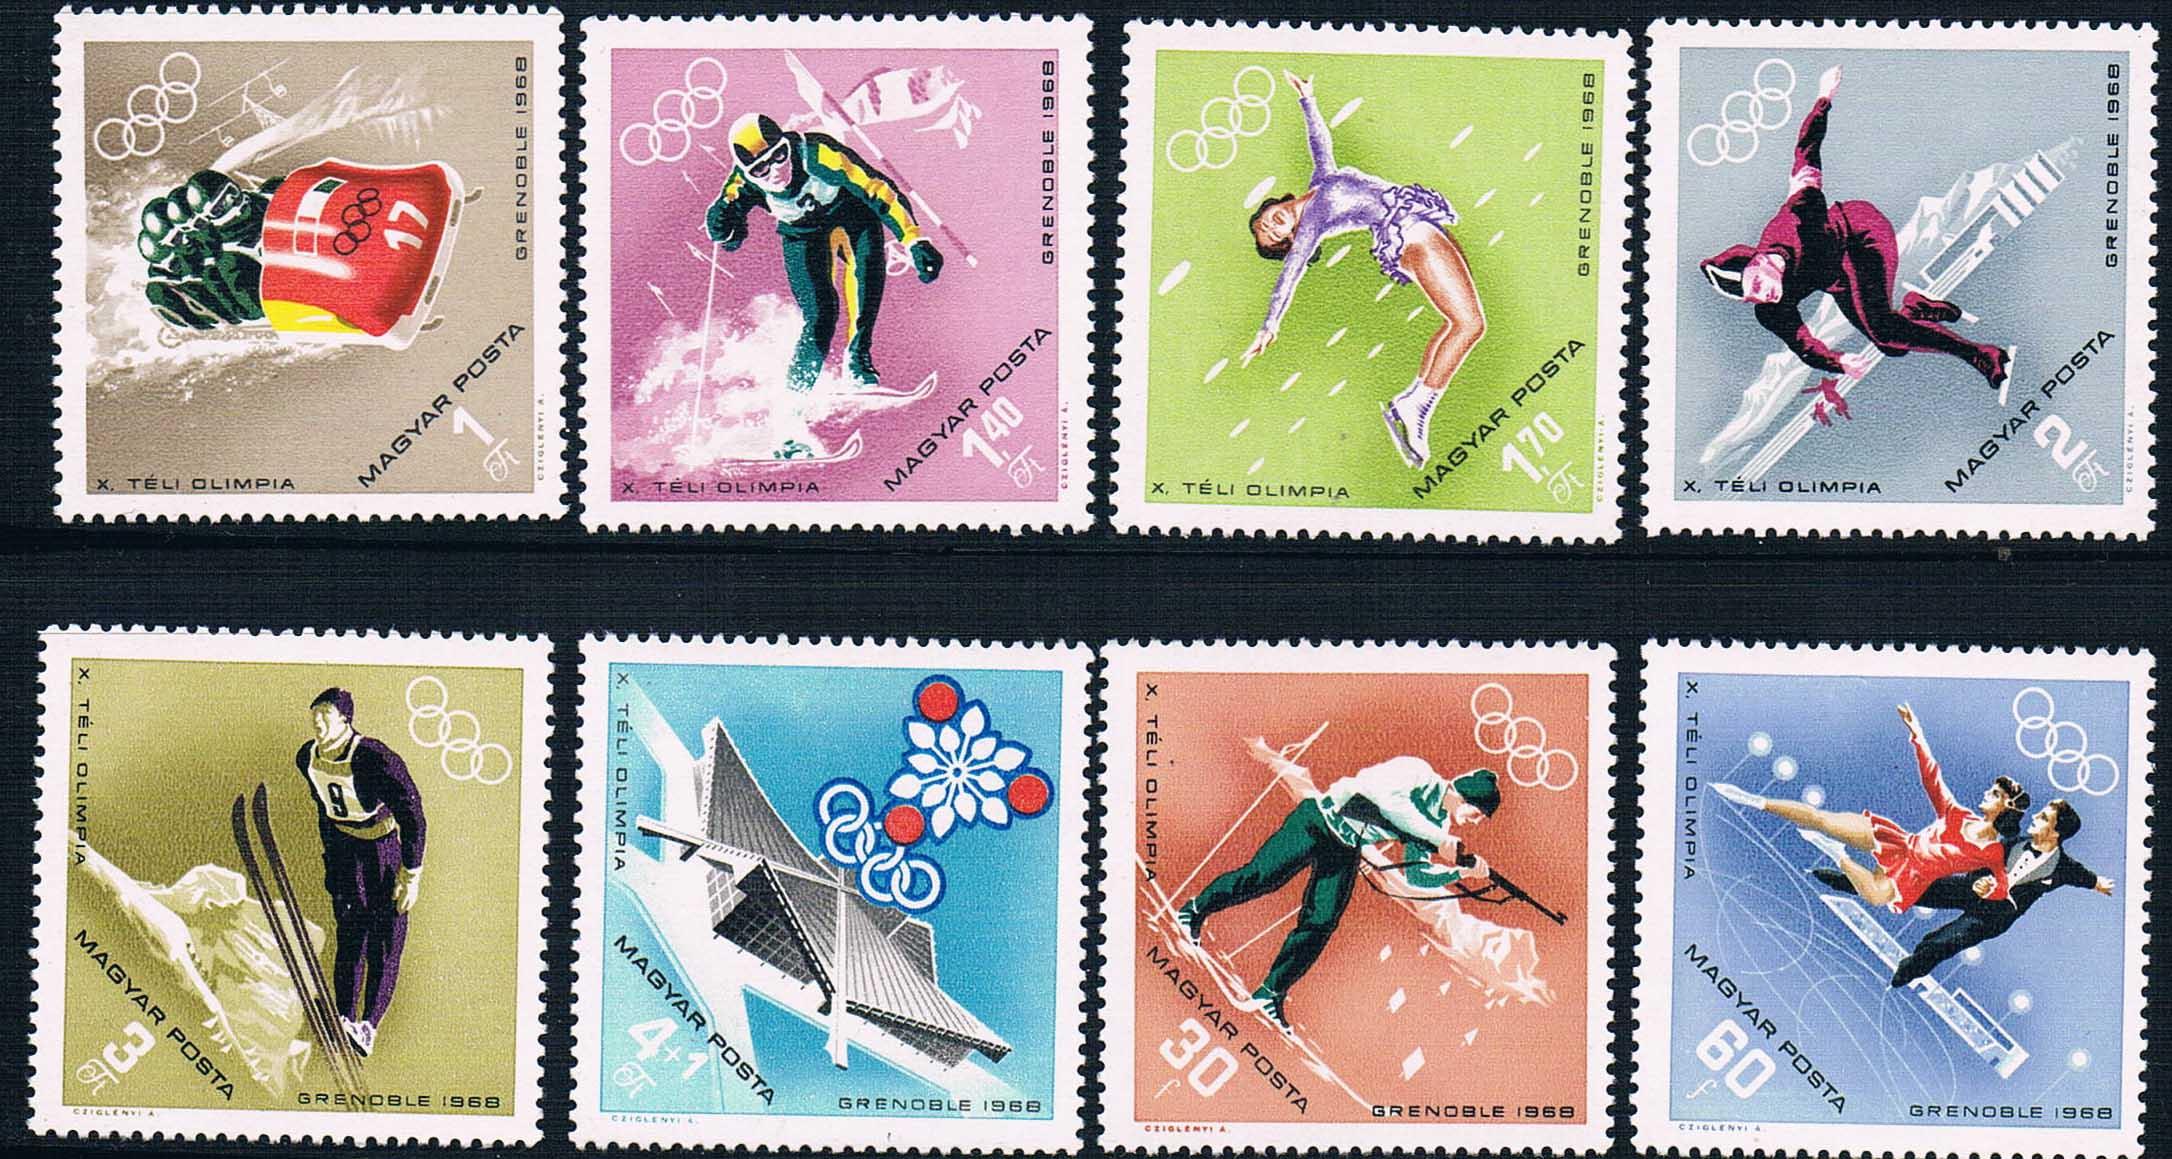 H0121 Hungary 1968 Winter Olympics 8 NEW hungary